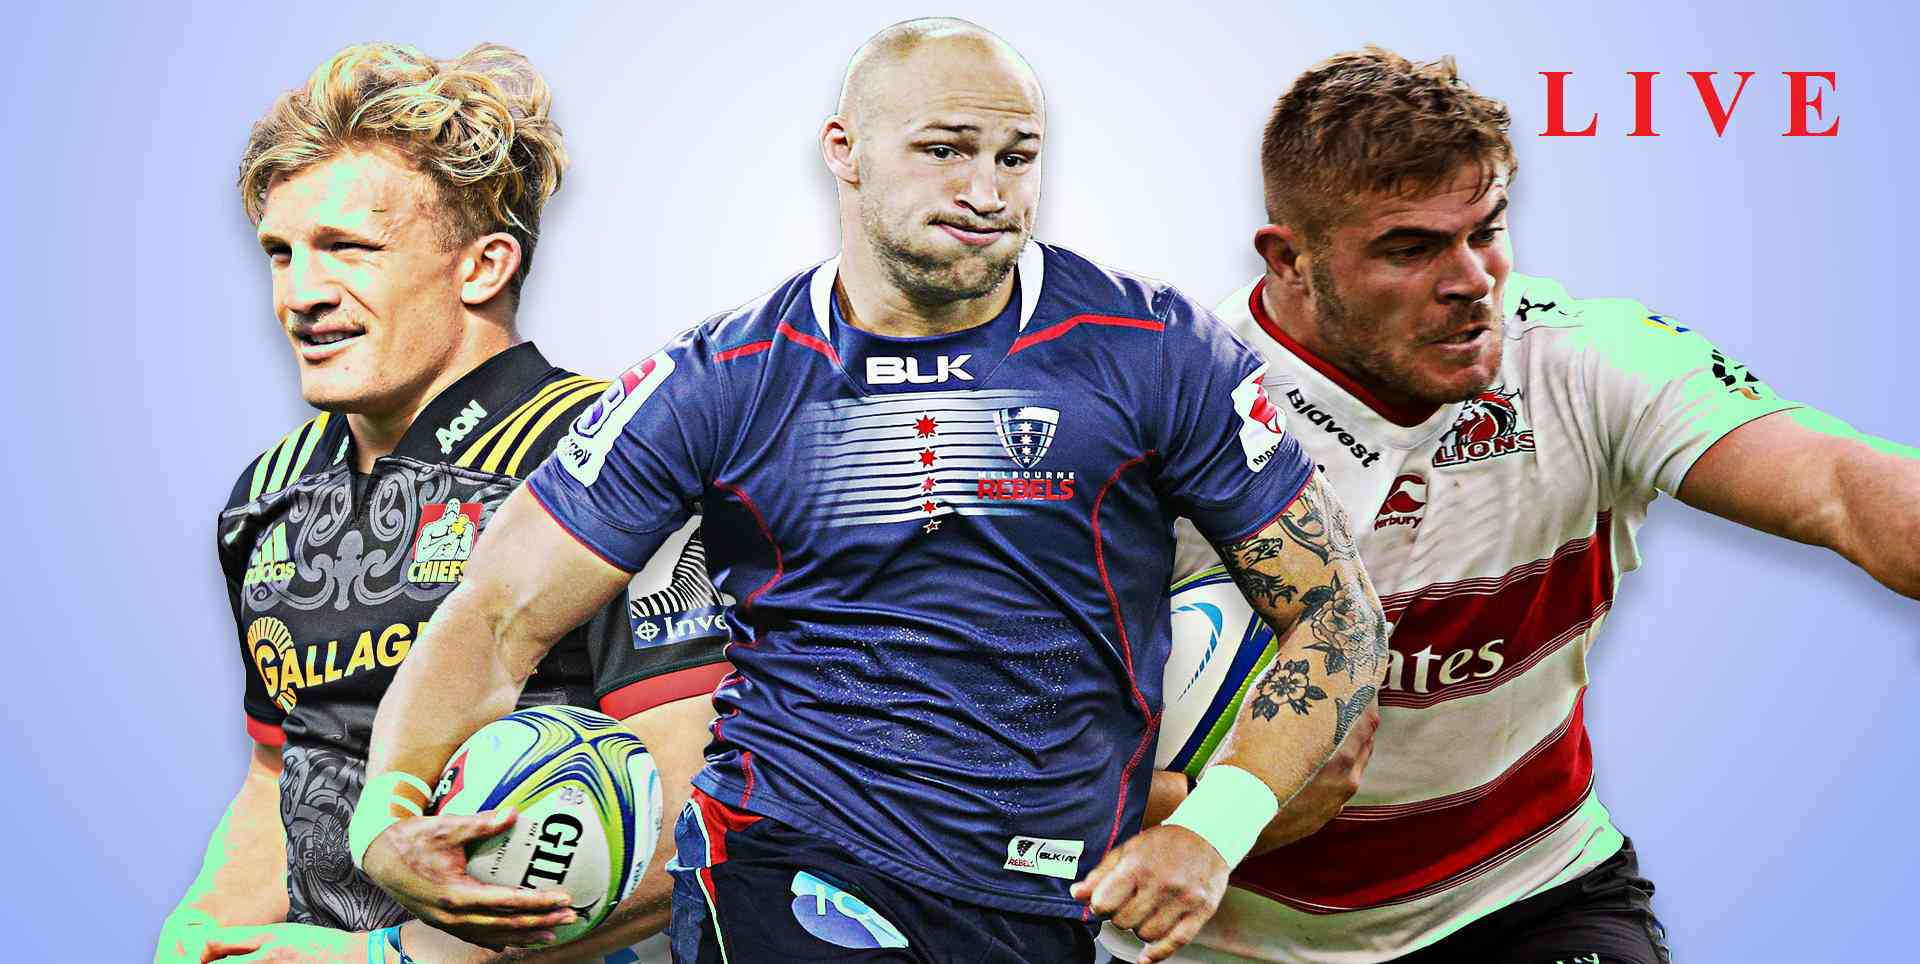 live-rugby-scarlets-vs-dragons